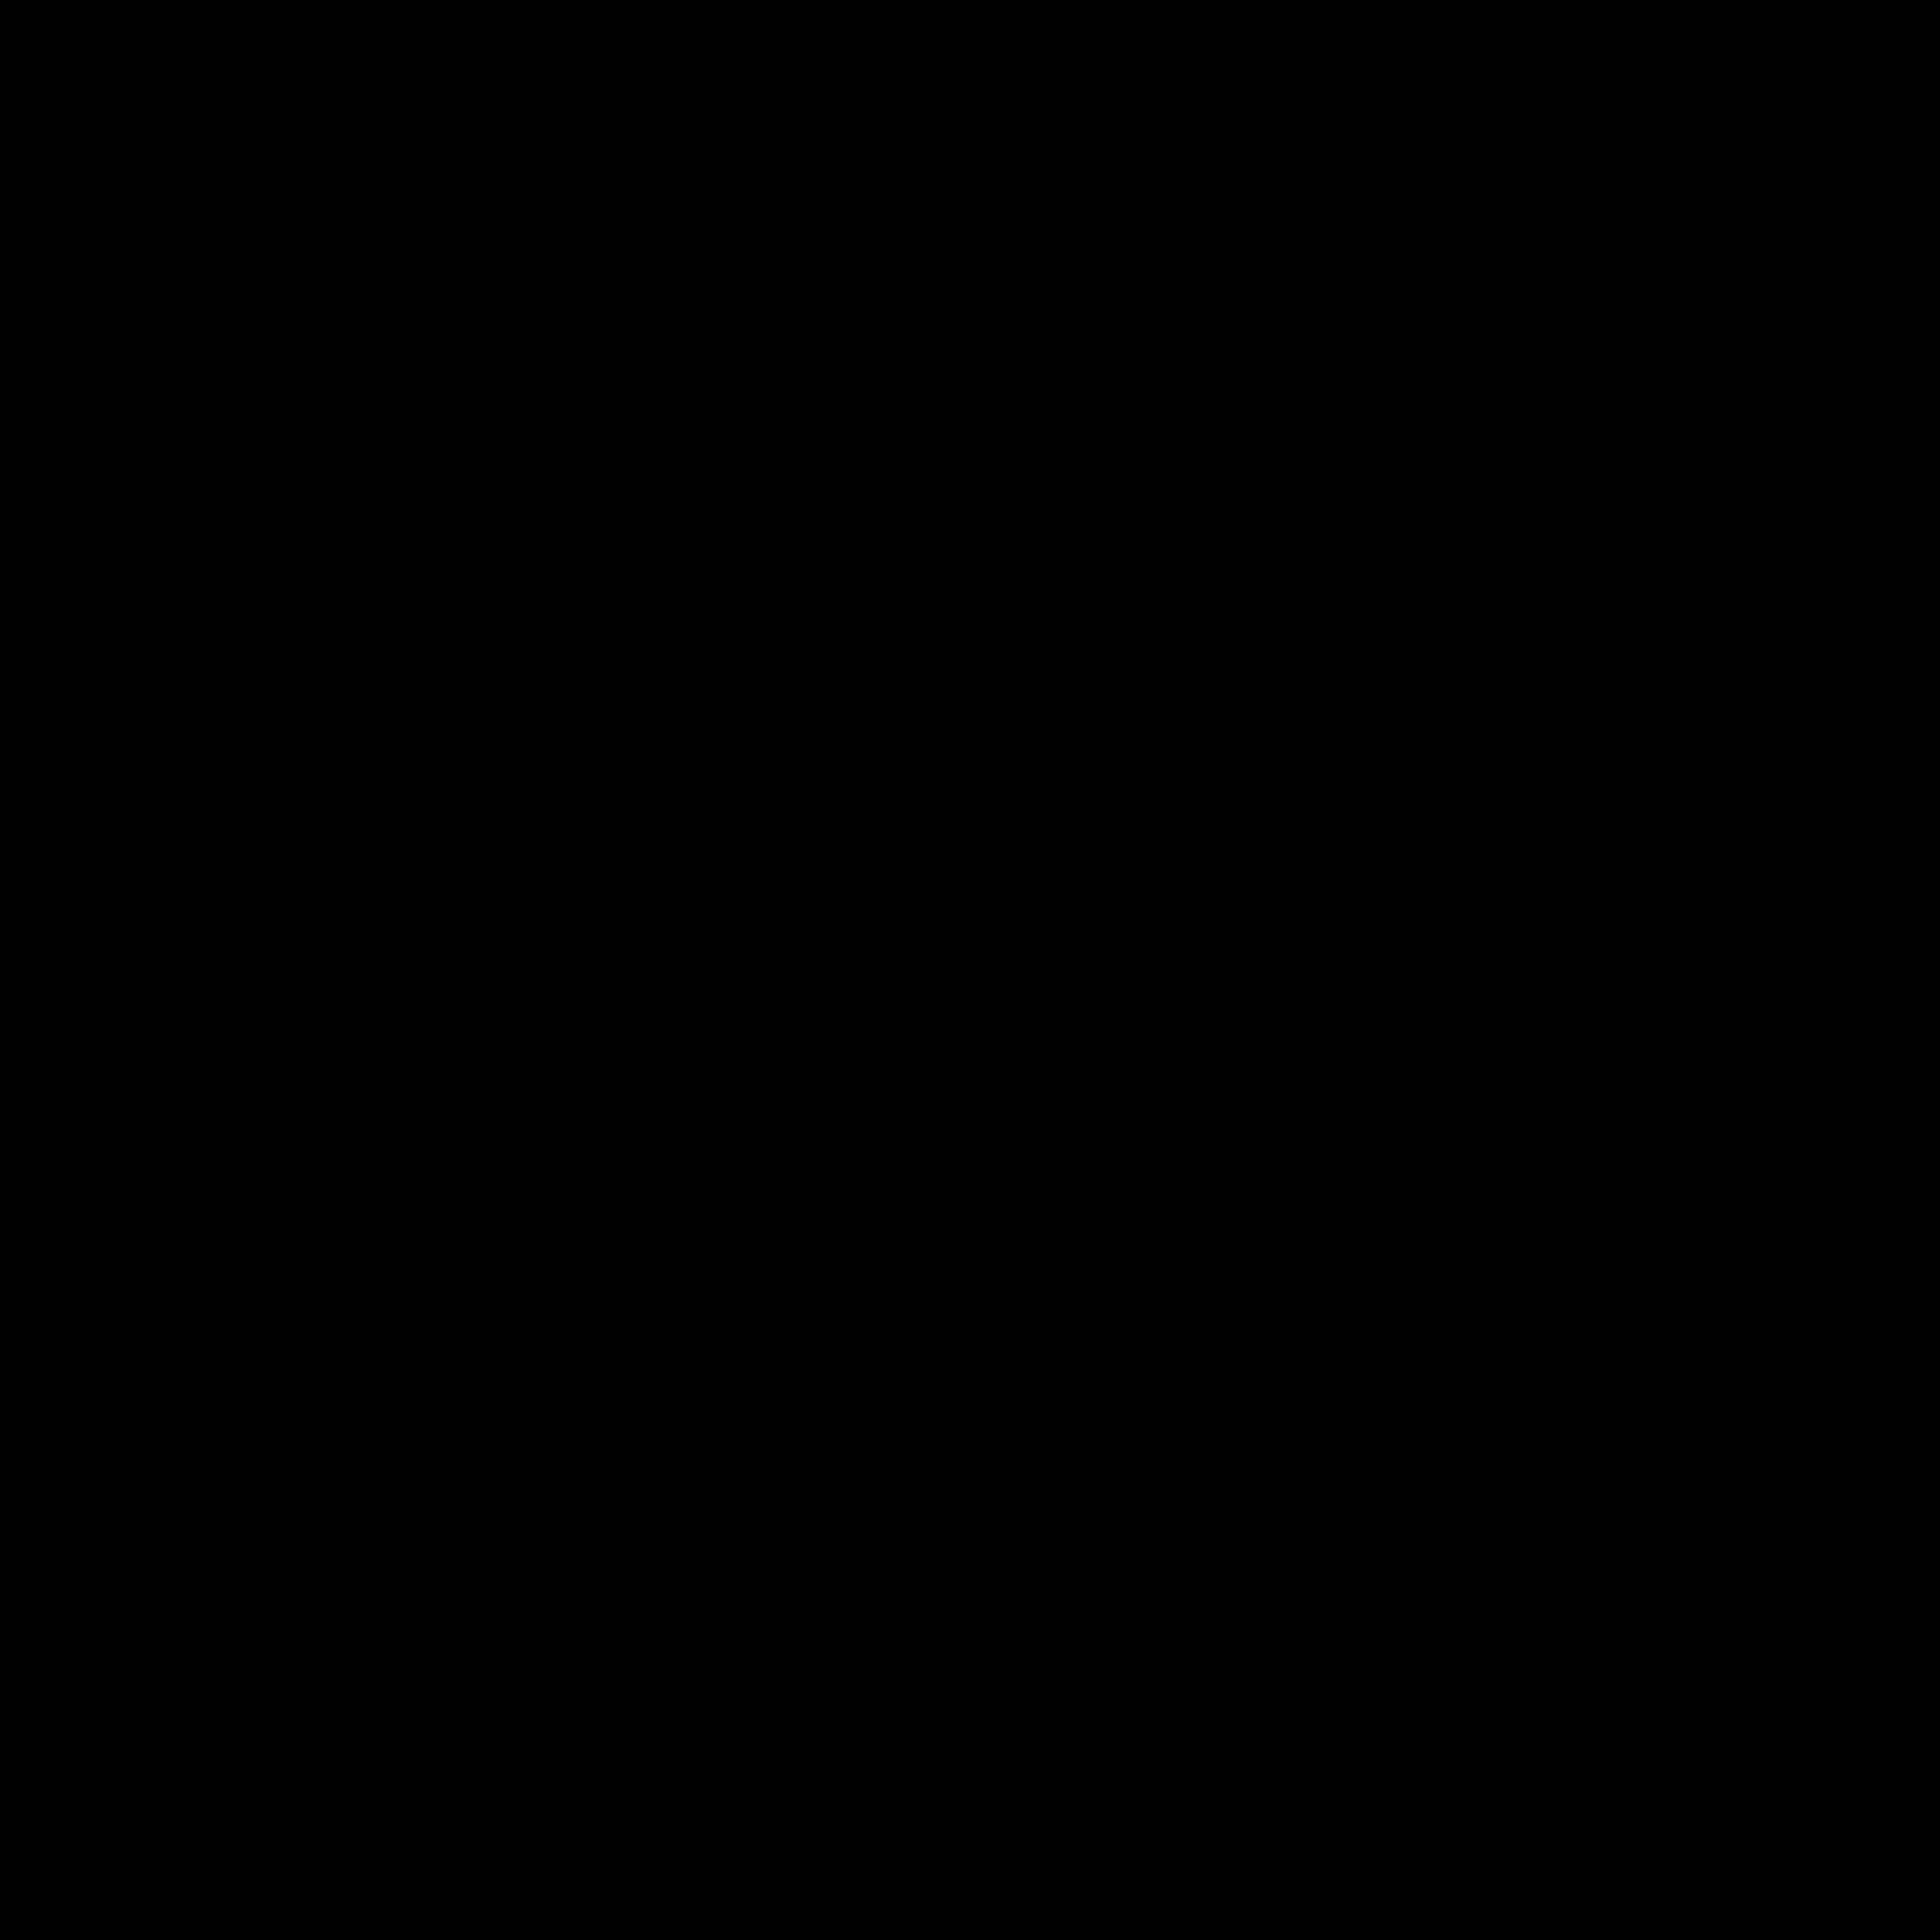 2400x2400 Clipart